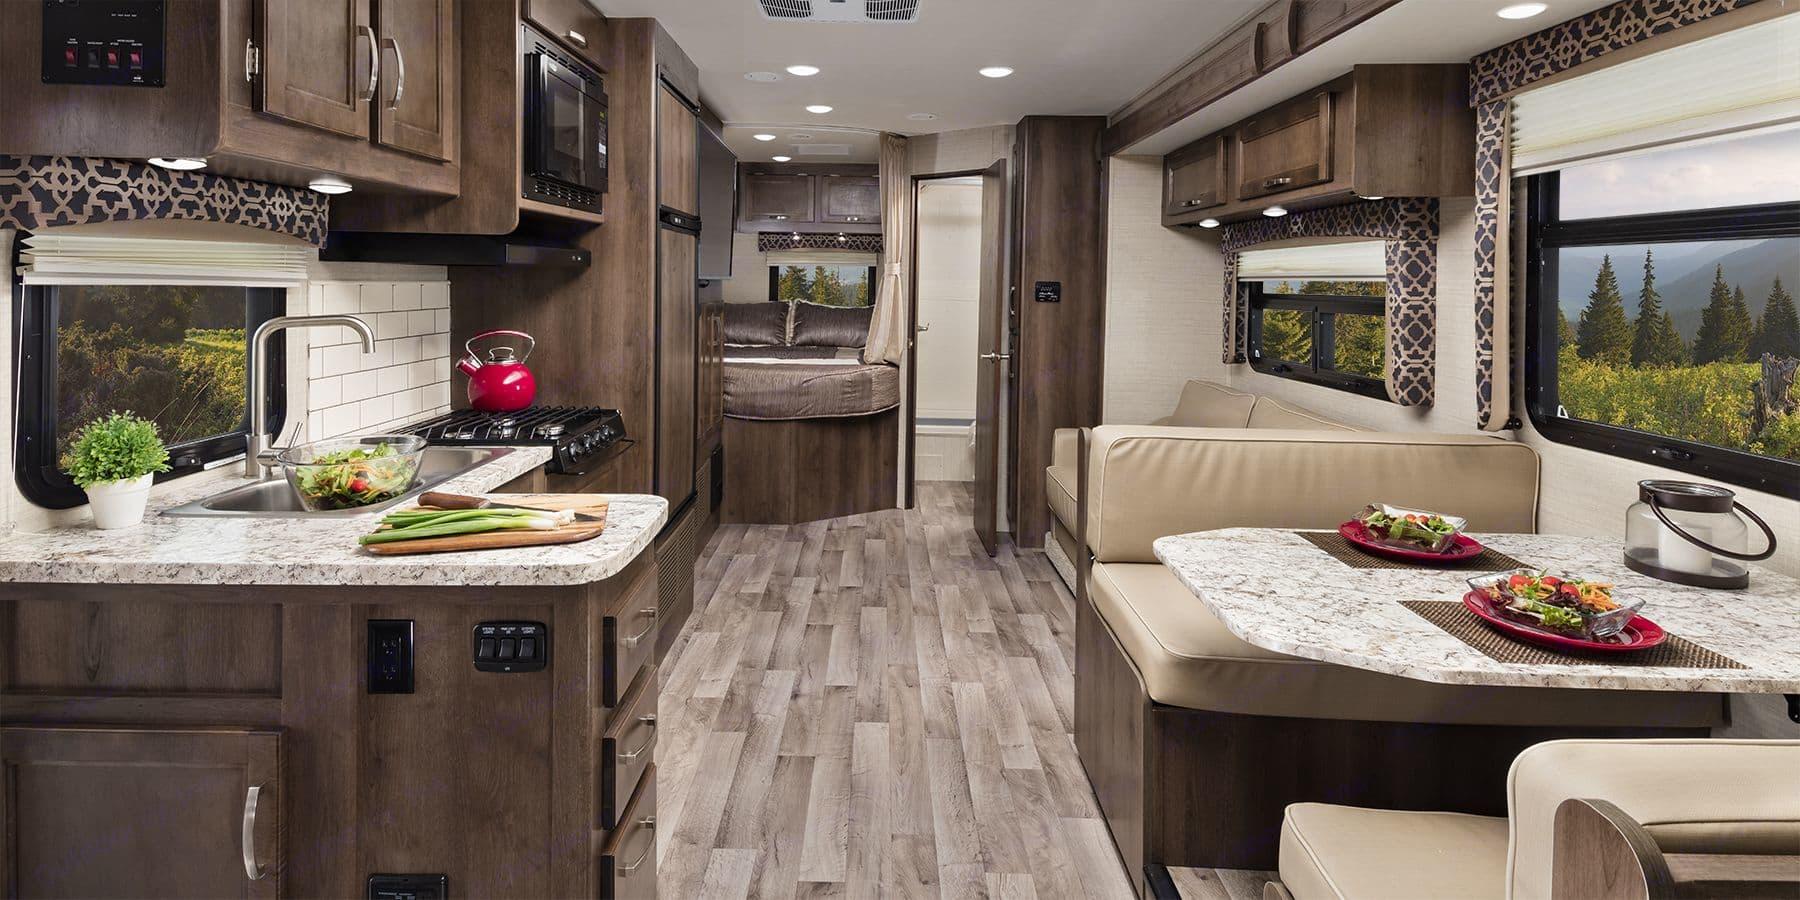 Full kitchen and bathroom areas.. Jayco Redhawk 2019